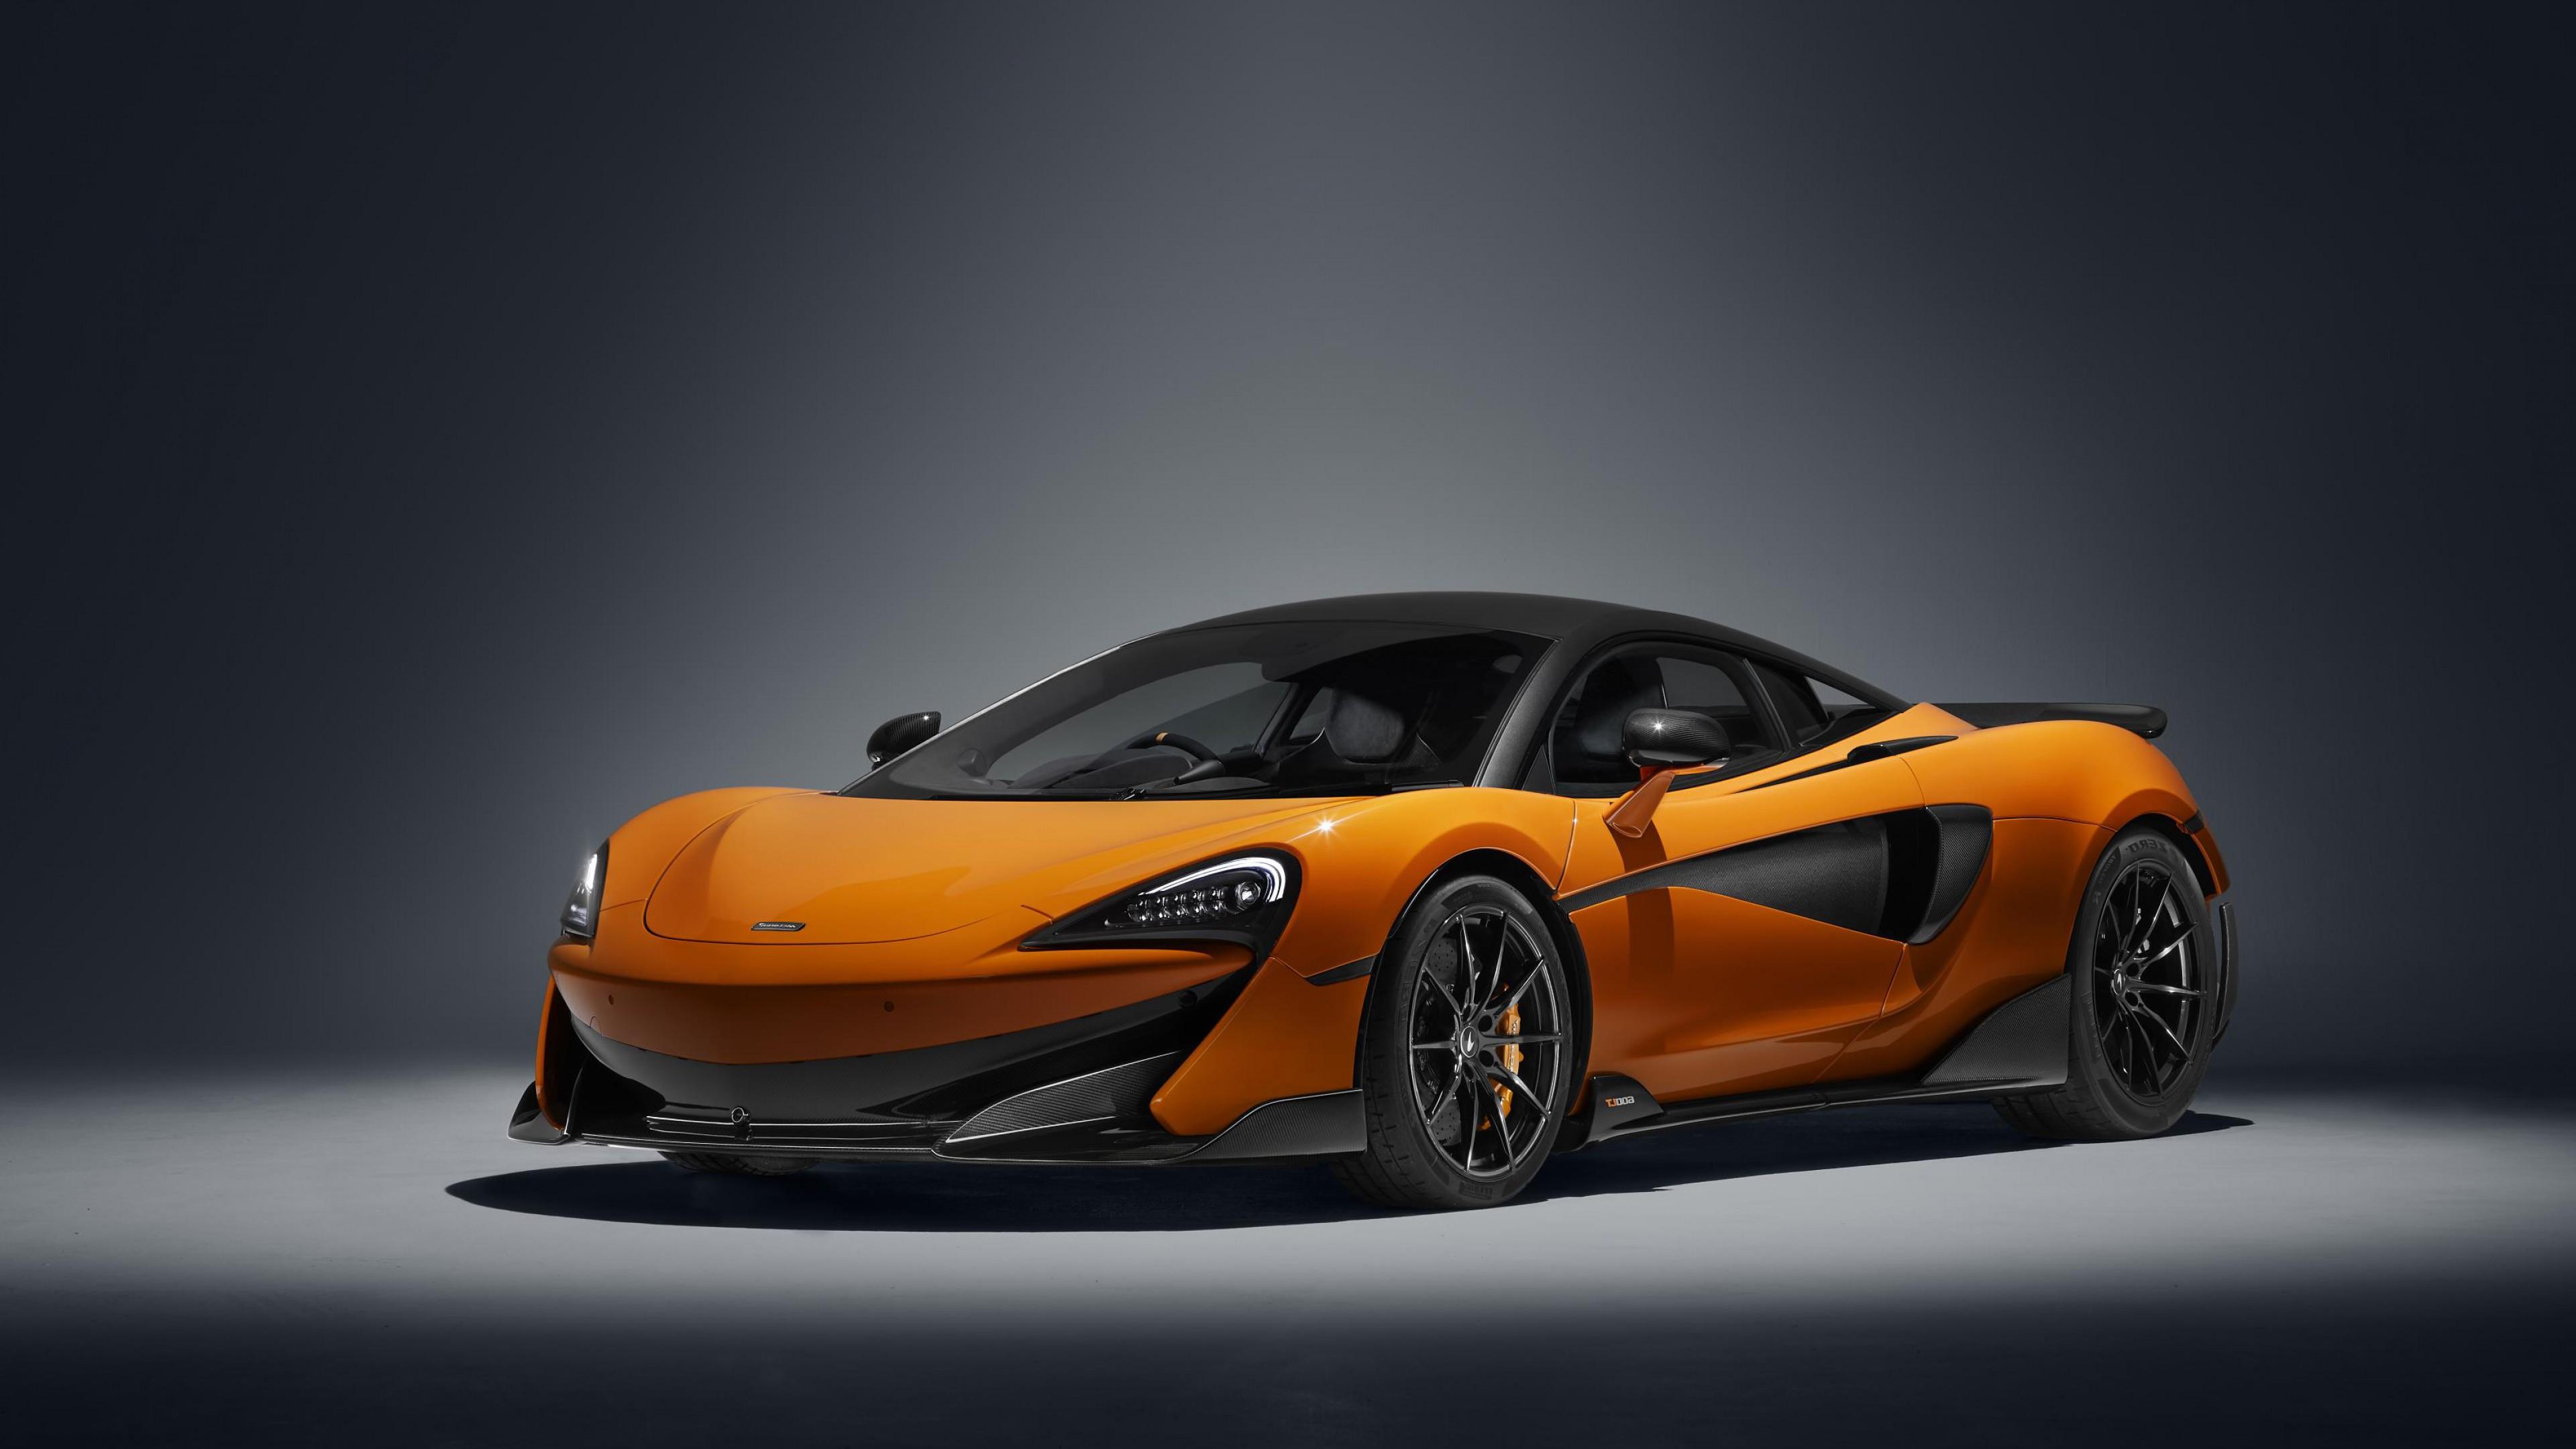 2019 Cars: Wallpaper McLaren 600LT, Supercar, 2019 Cars, 4K, Cars